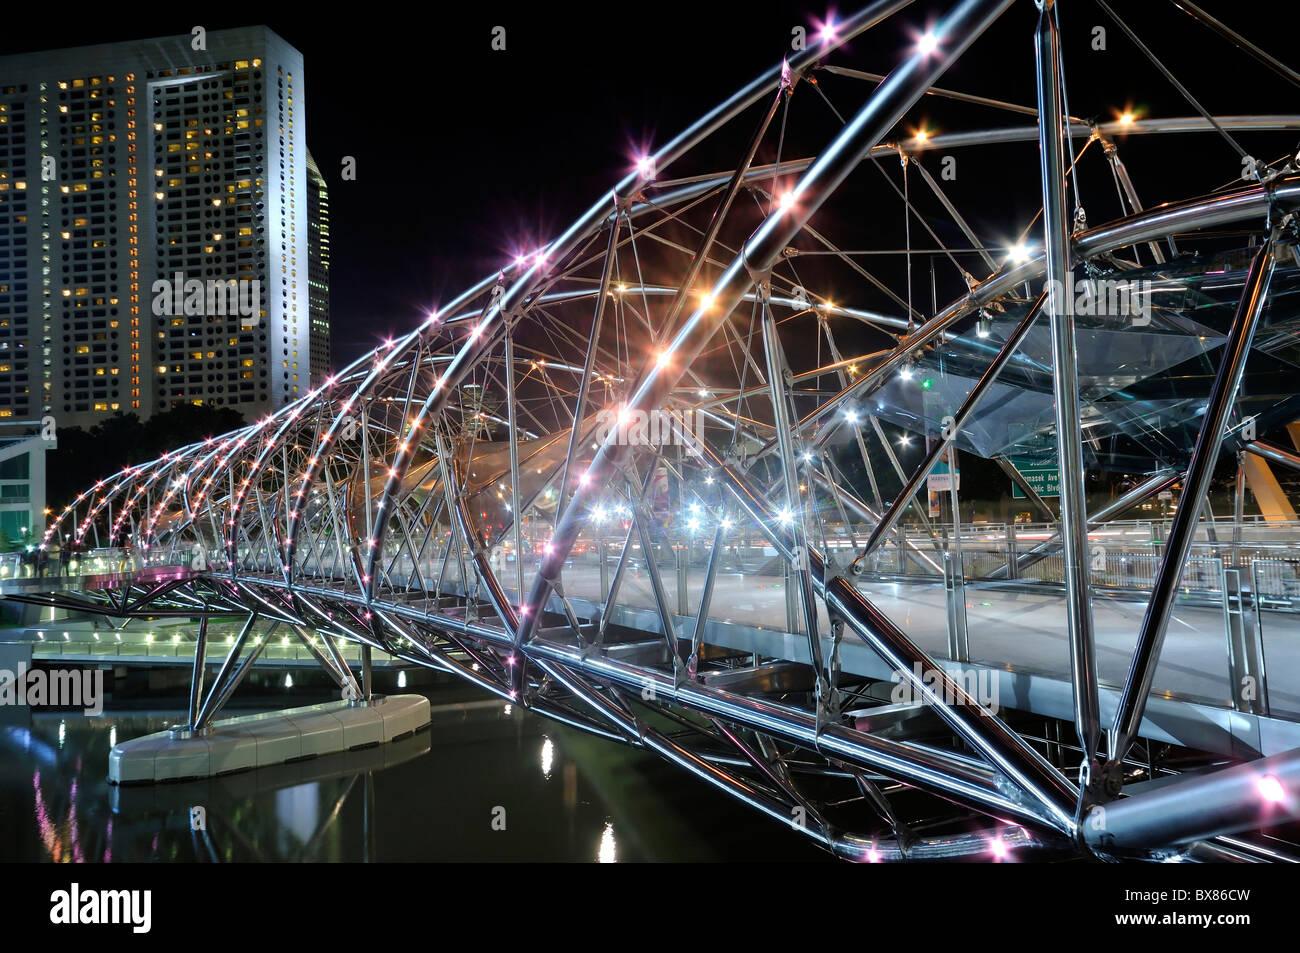 The iconic Double Helix Bridge in Singapore overlooking the Marina skyline. Stock Photo